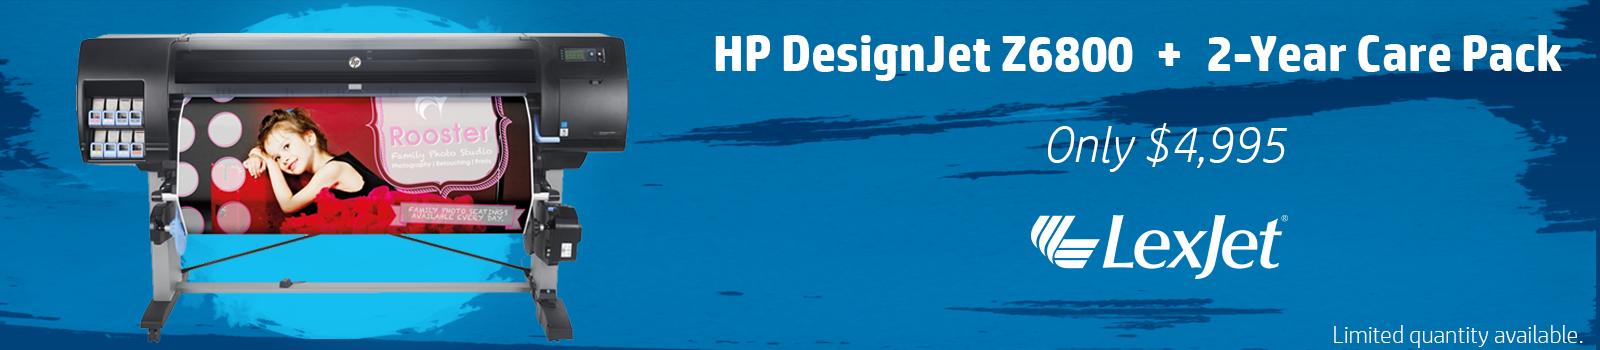 HP Printer+Care Pack Banner